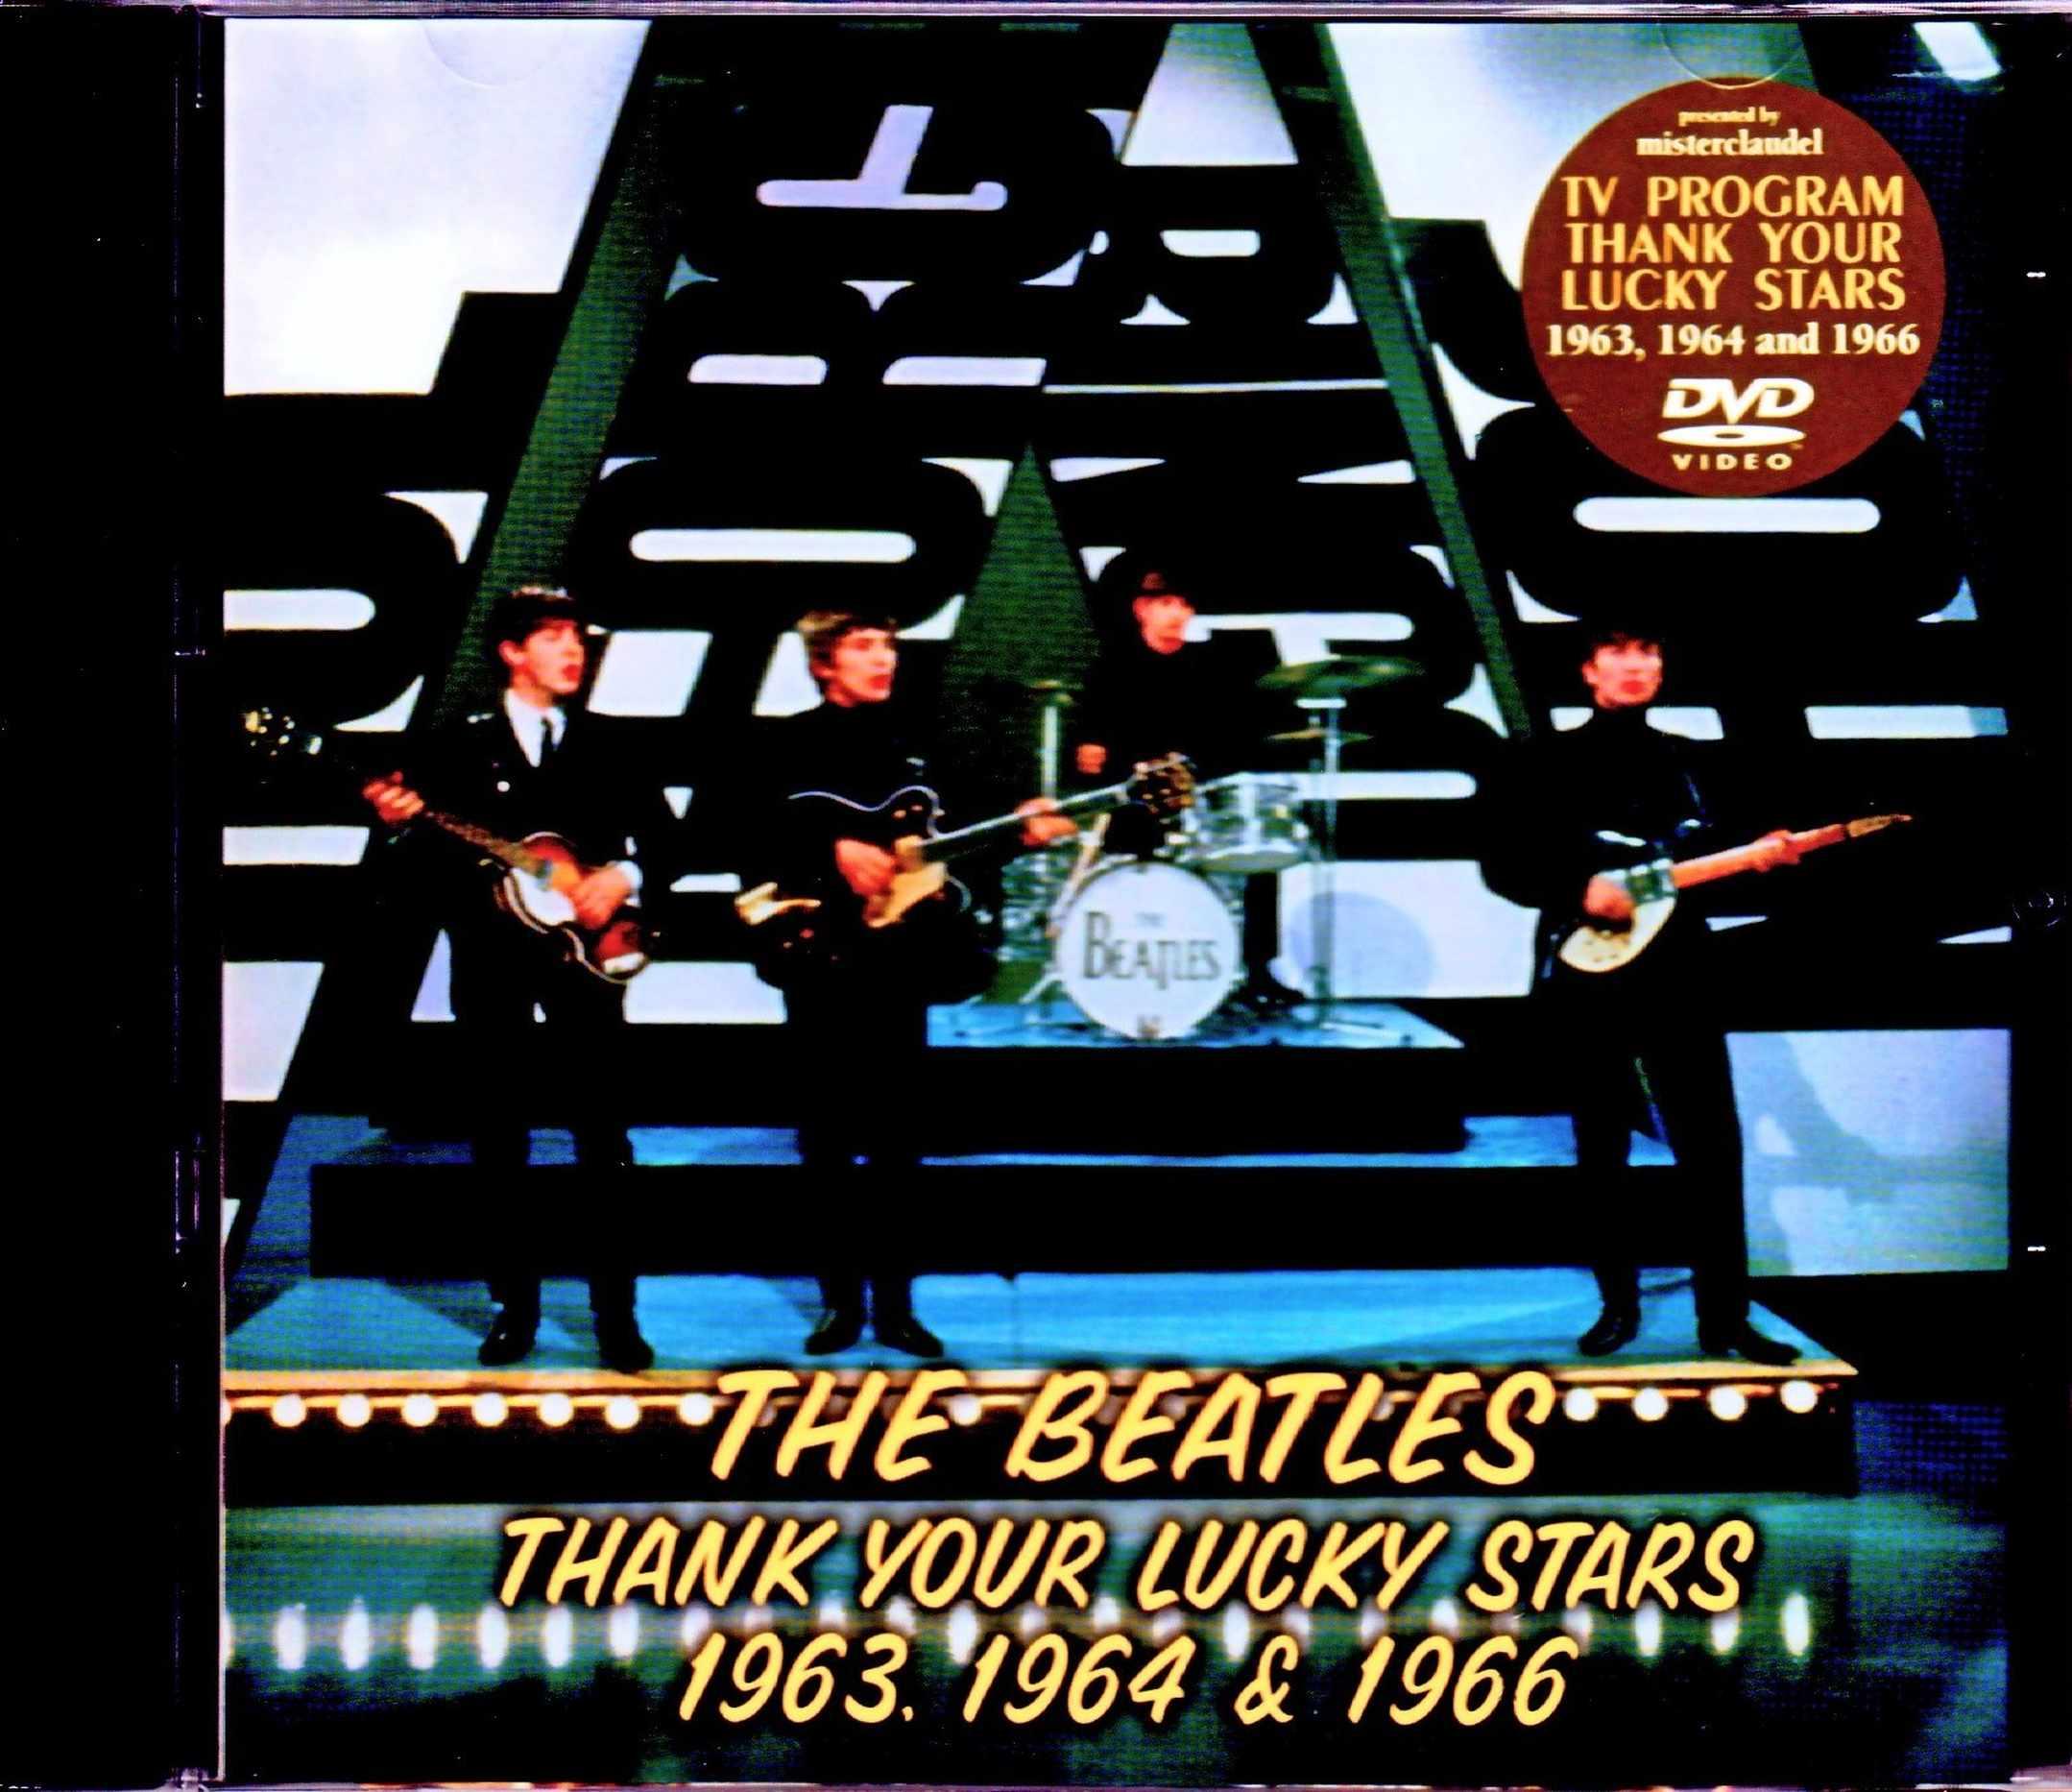 Beatles ビートルズ/TV Program Thank Your Lucky Stars 1963,1964 & 1966